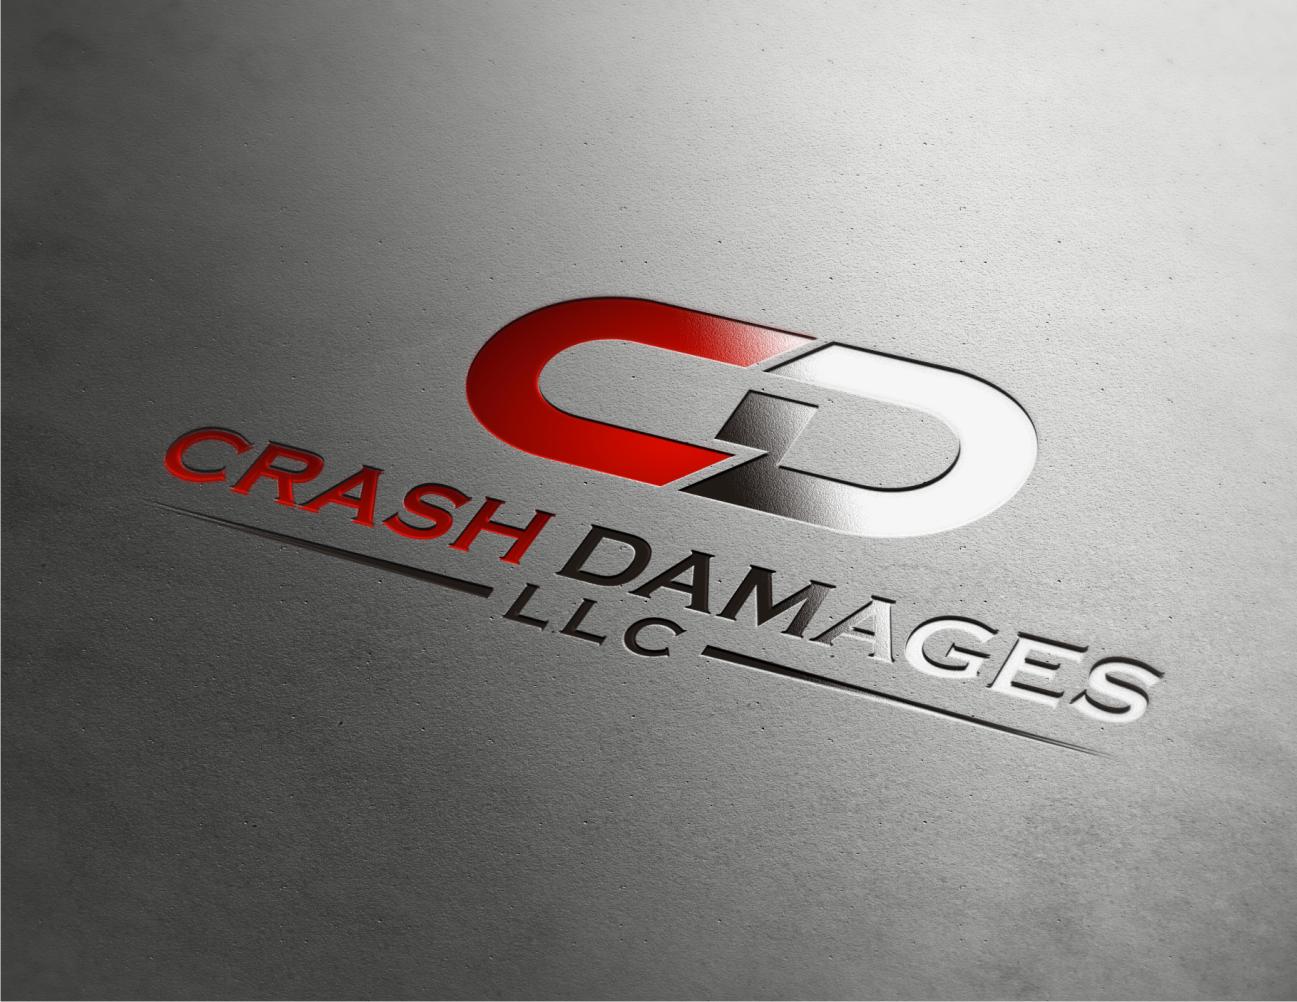 Help Crash Damages LLC with a new logo